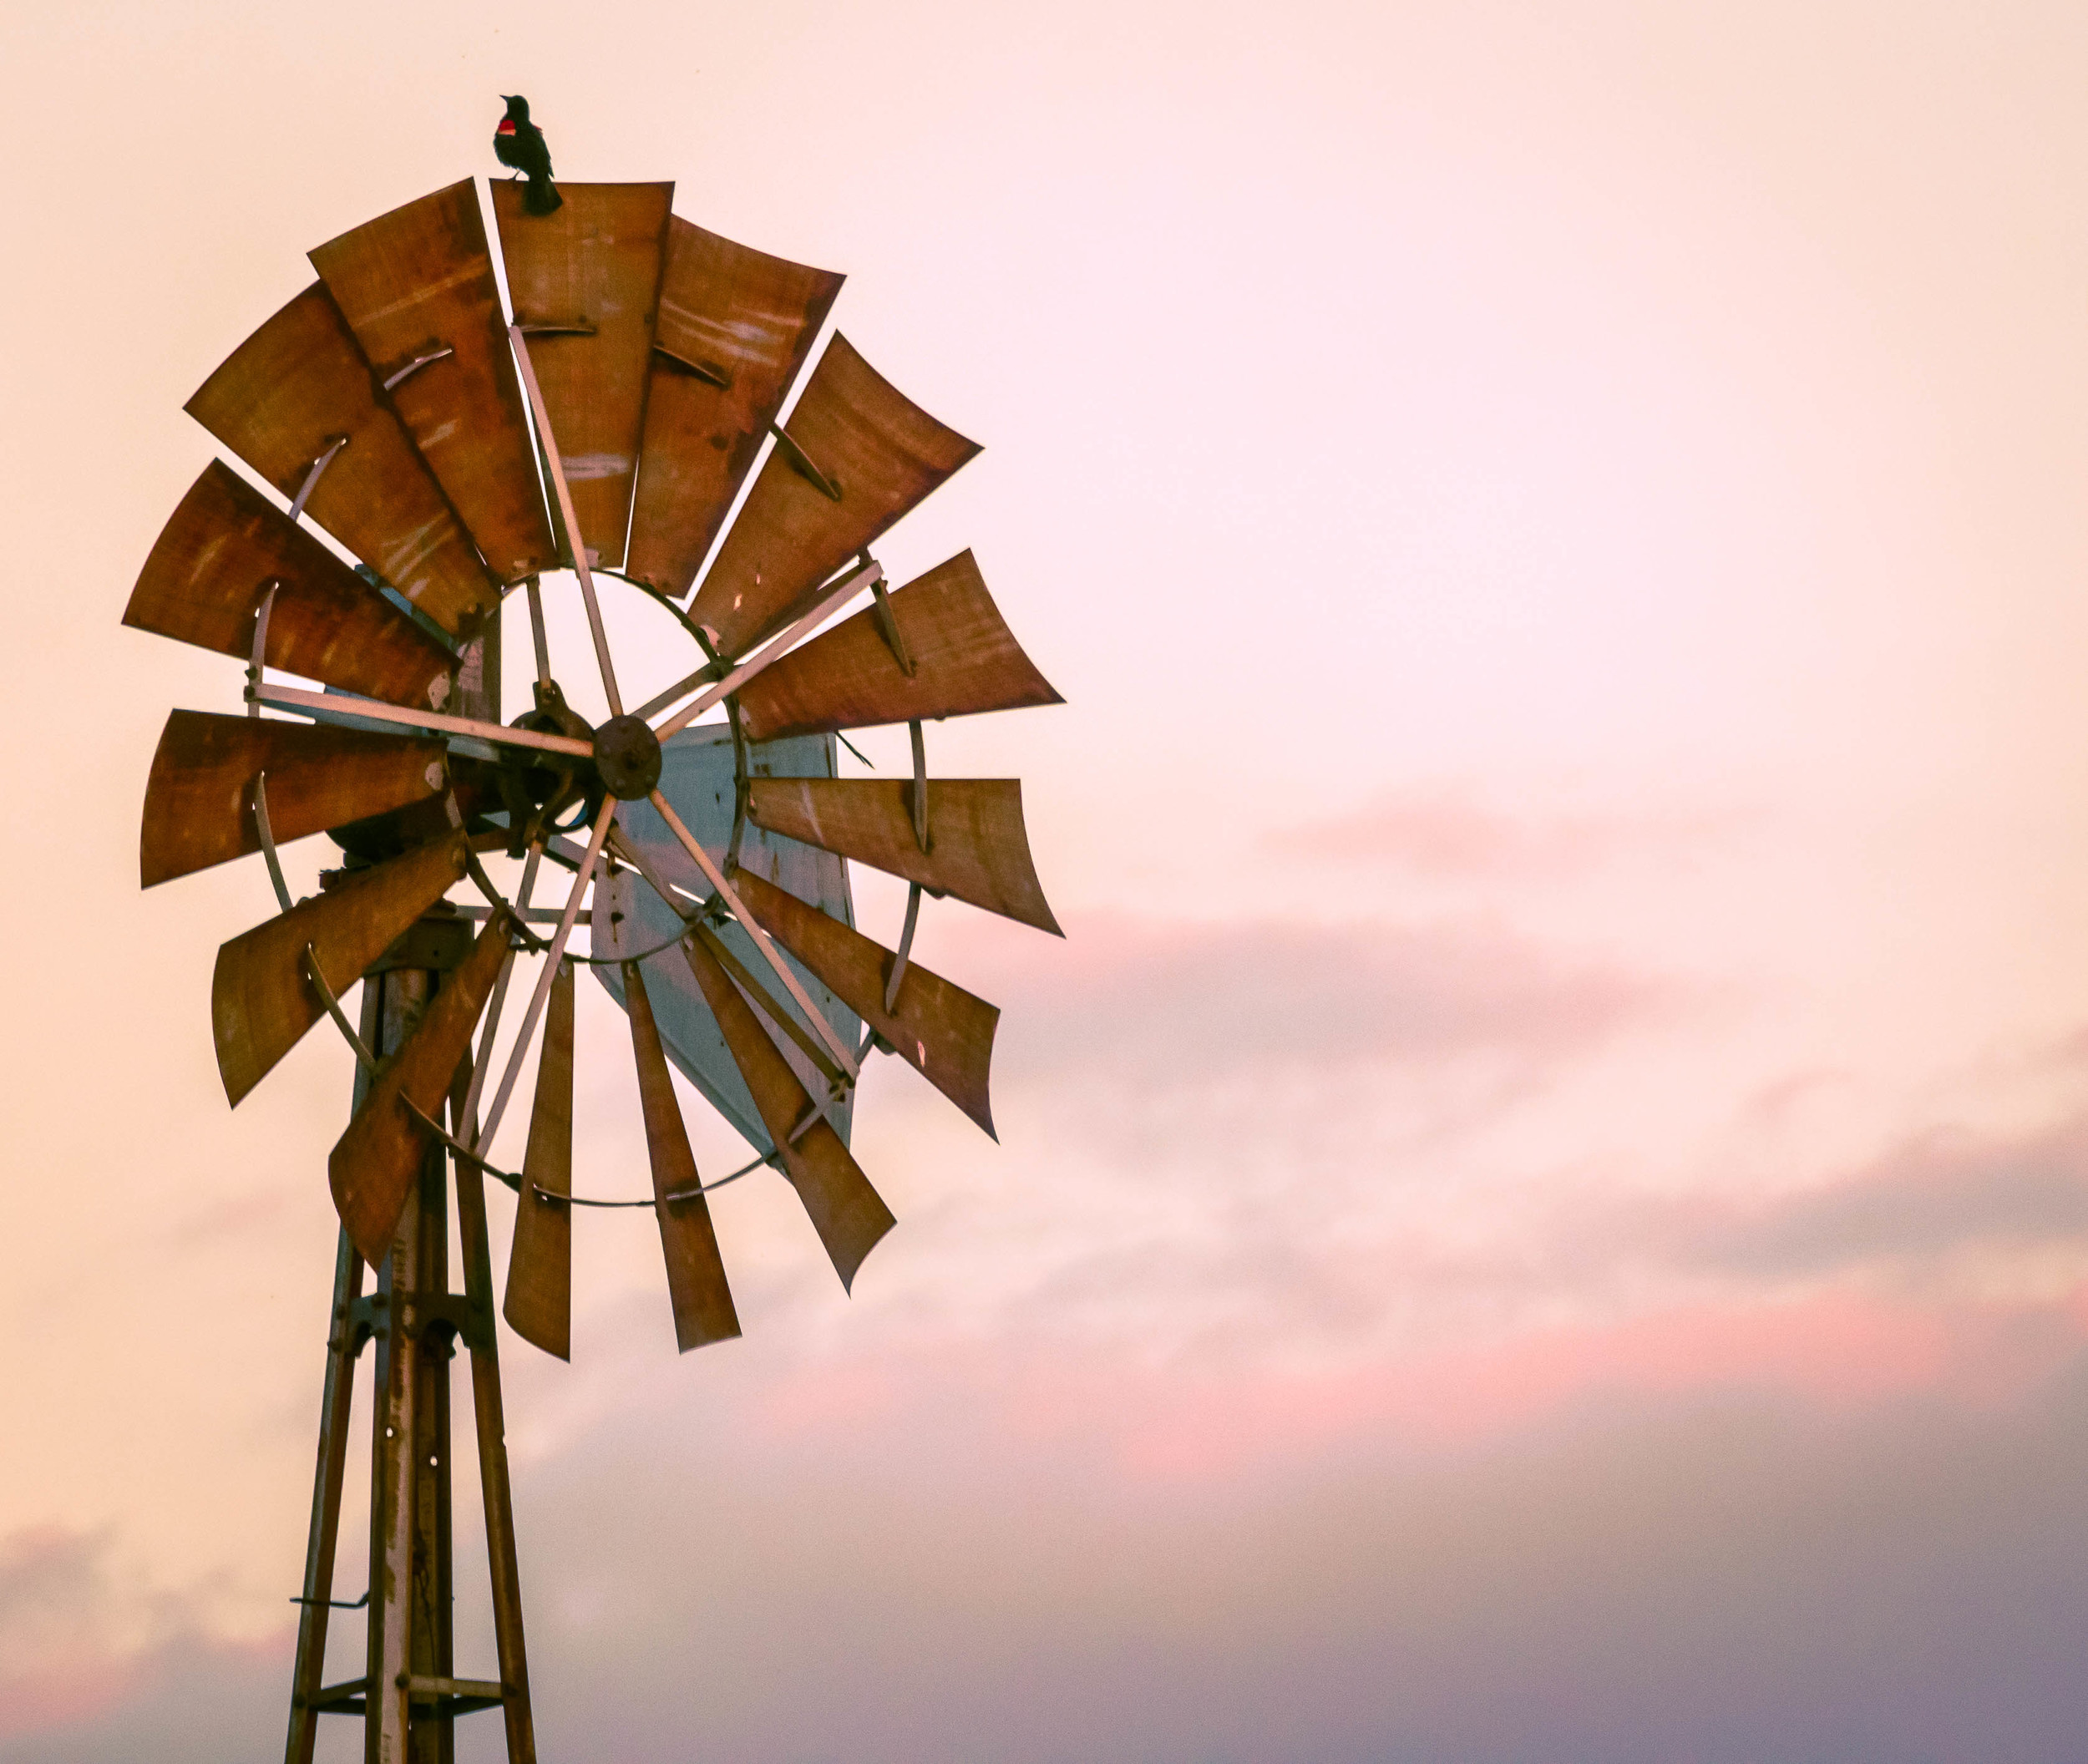 oklahoma piedmont windmill